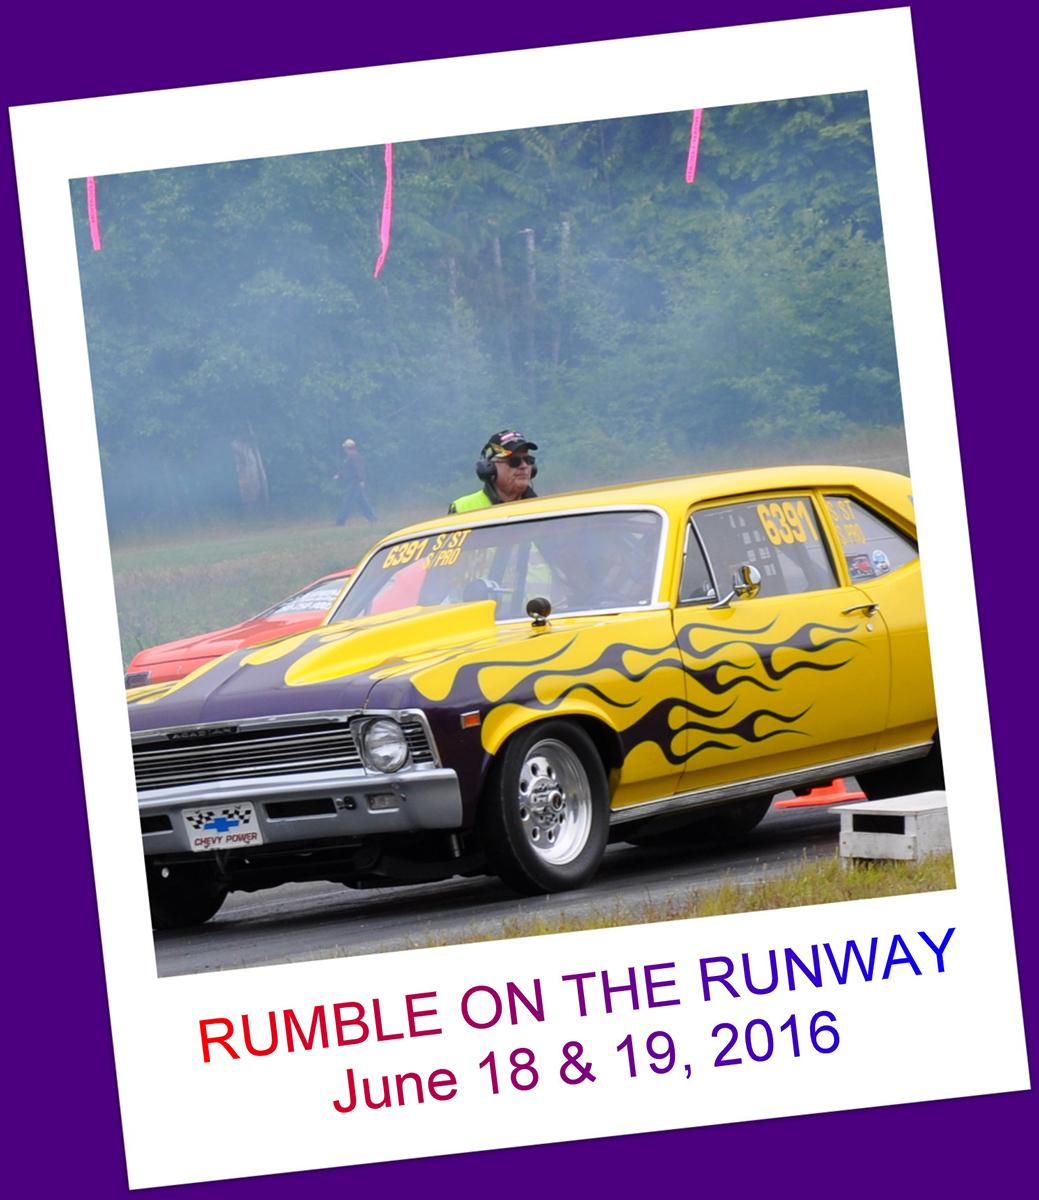 Rumble on the Runway June 18 & 19, 2016 975